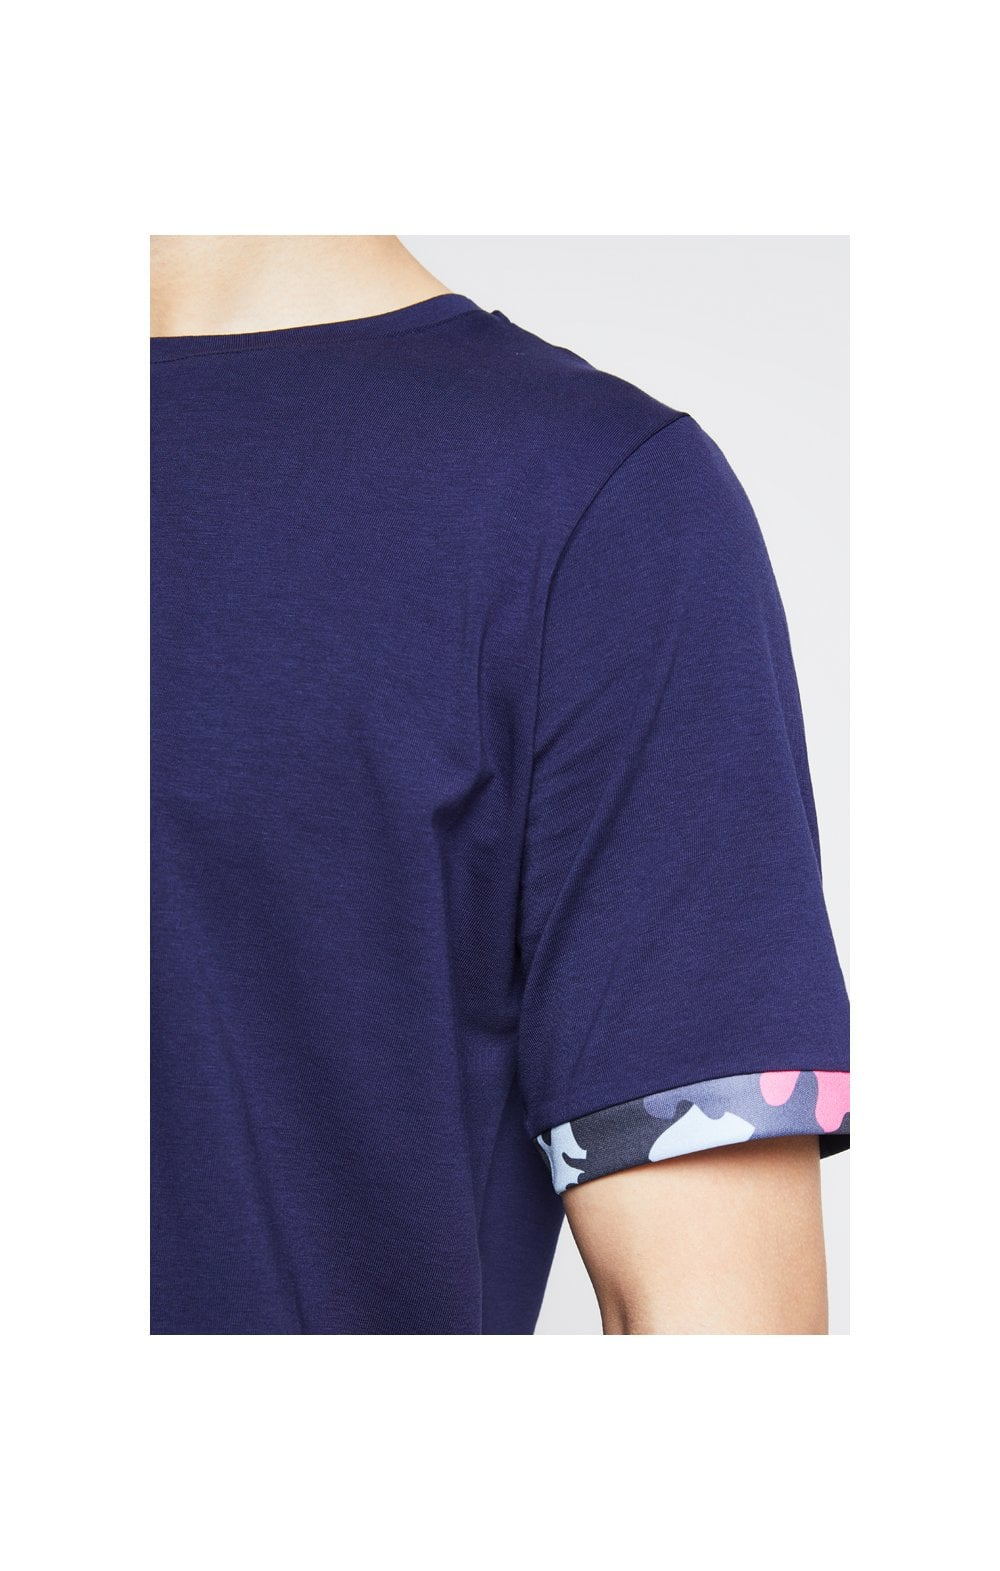 Illusive London Contrast Cuff Tee  Navy & Neon Pink Camo Kids Top